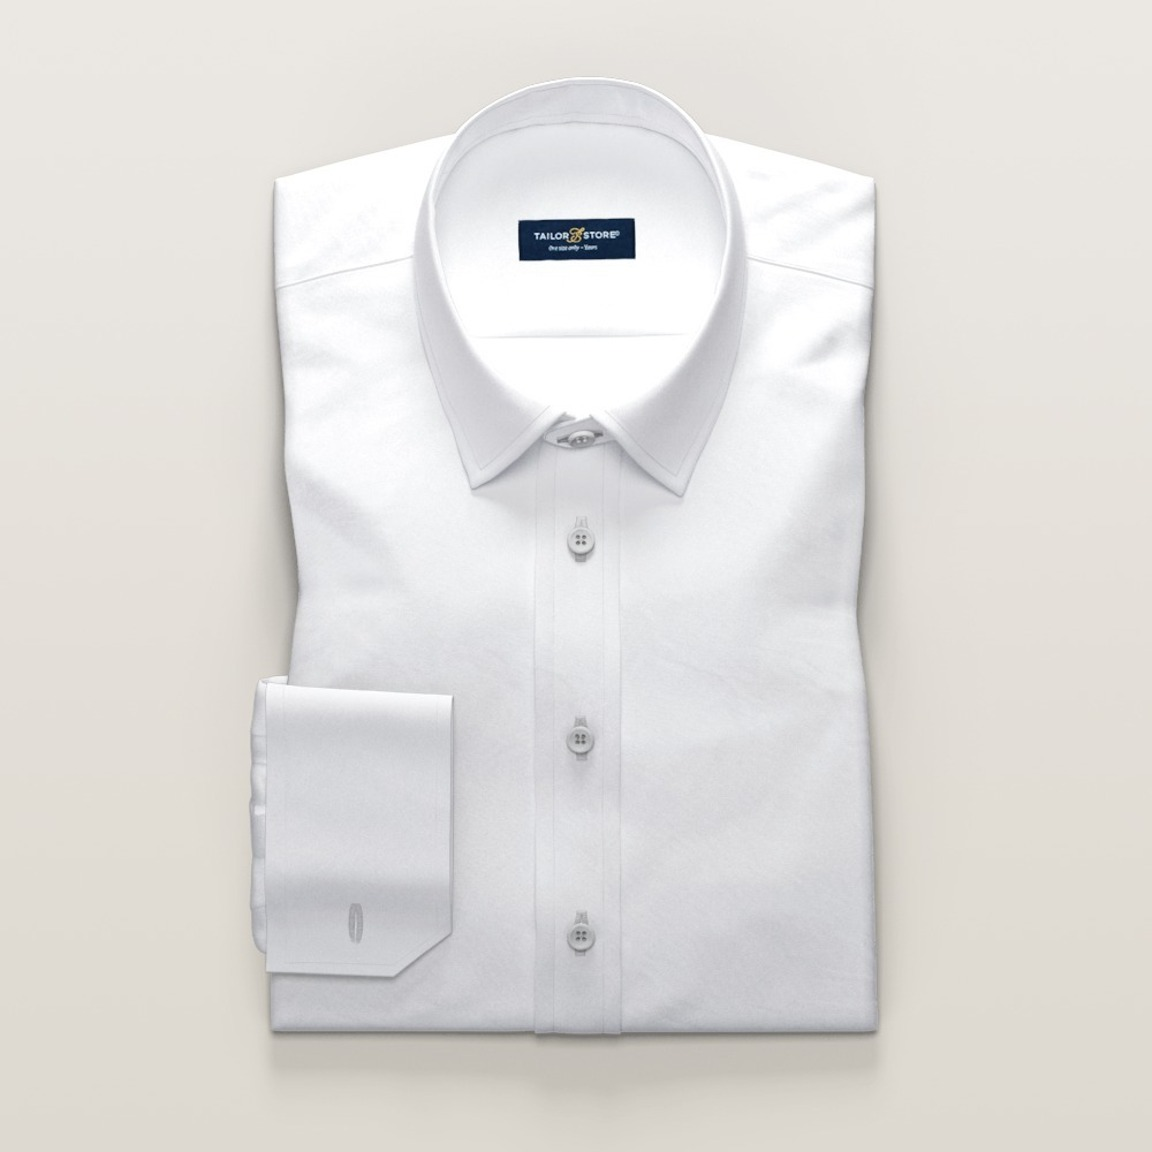 Business-skjorte i hvid